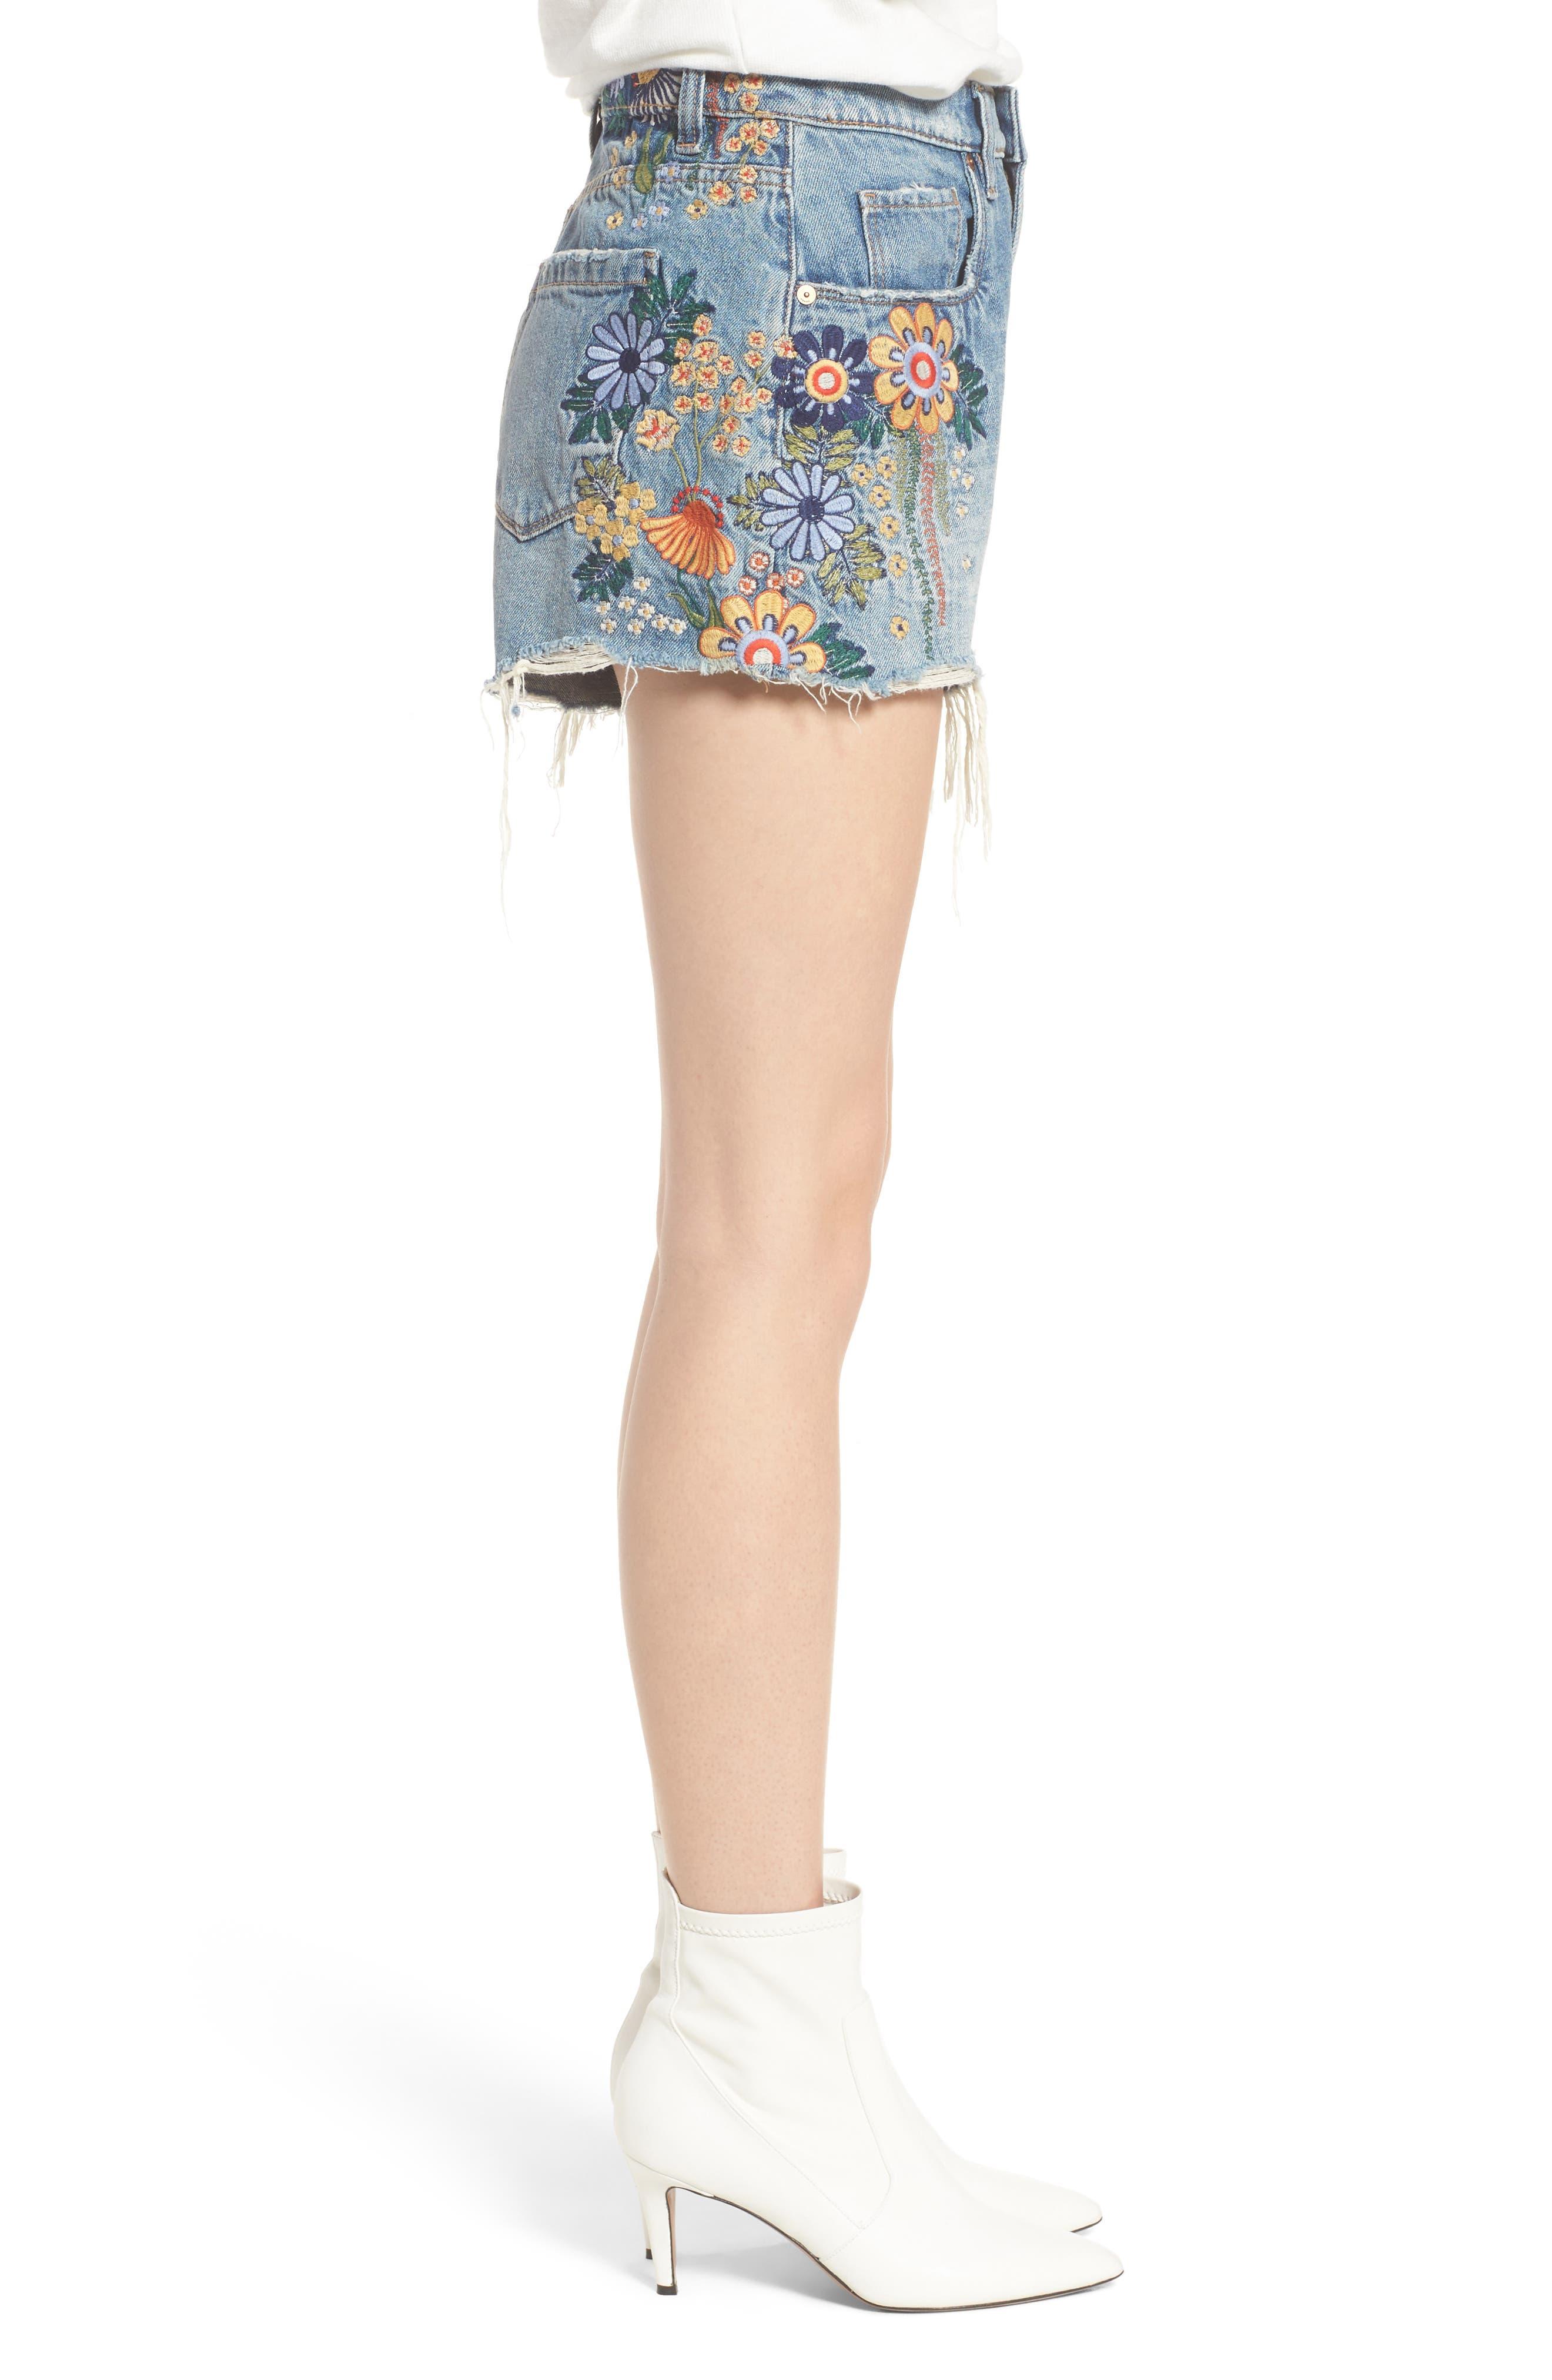 Sonic Bloom Embroidered Denim Shorts,                             Alternate thumbnail 3, color,                             Blue